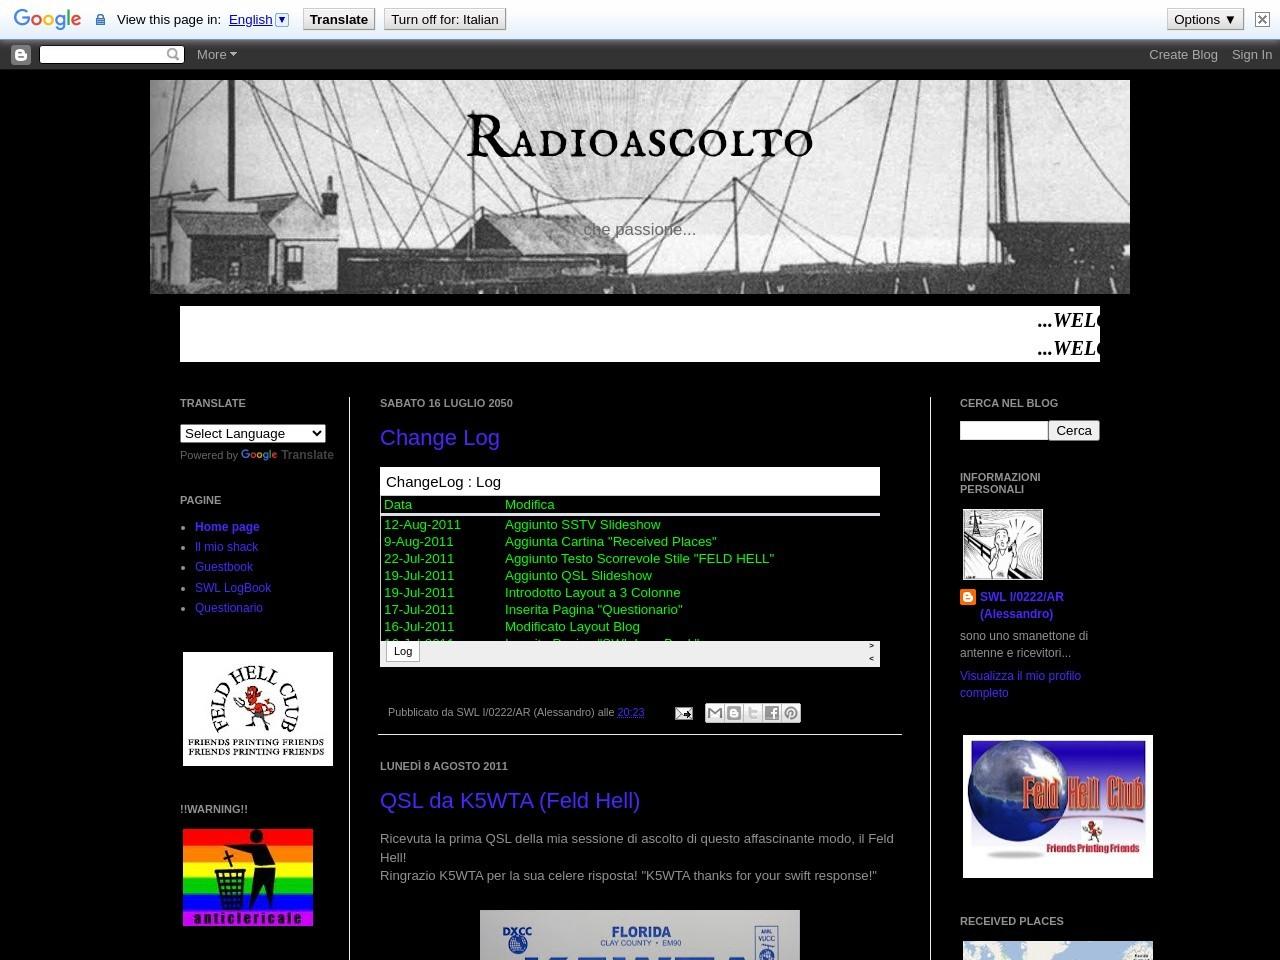 radioascolto